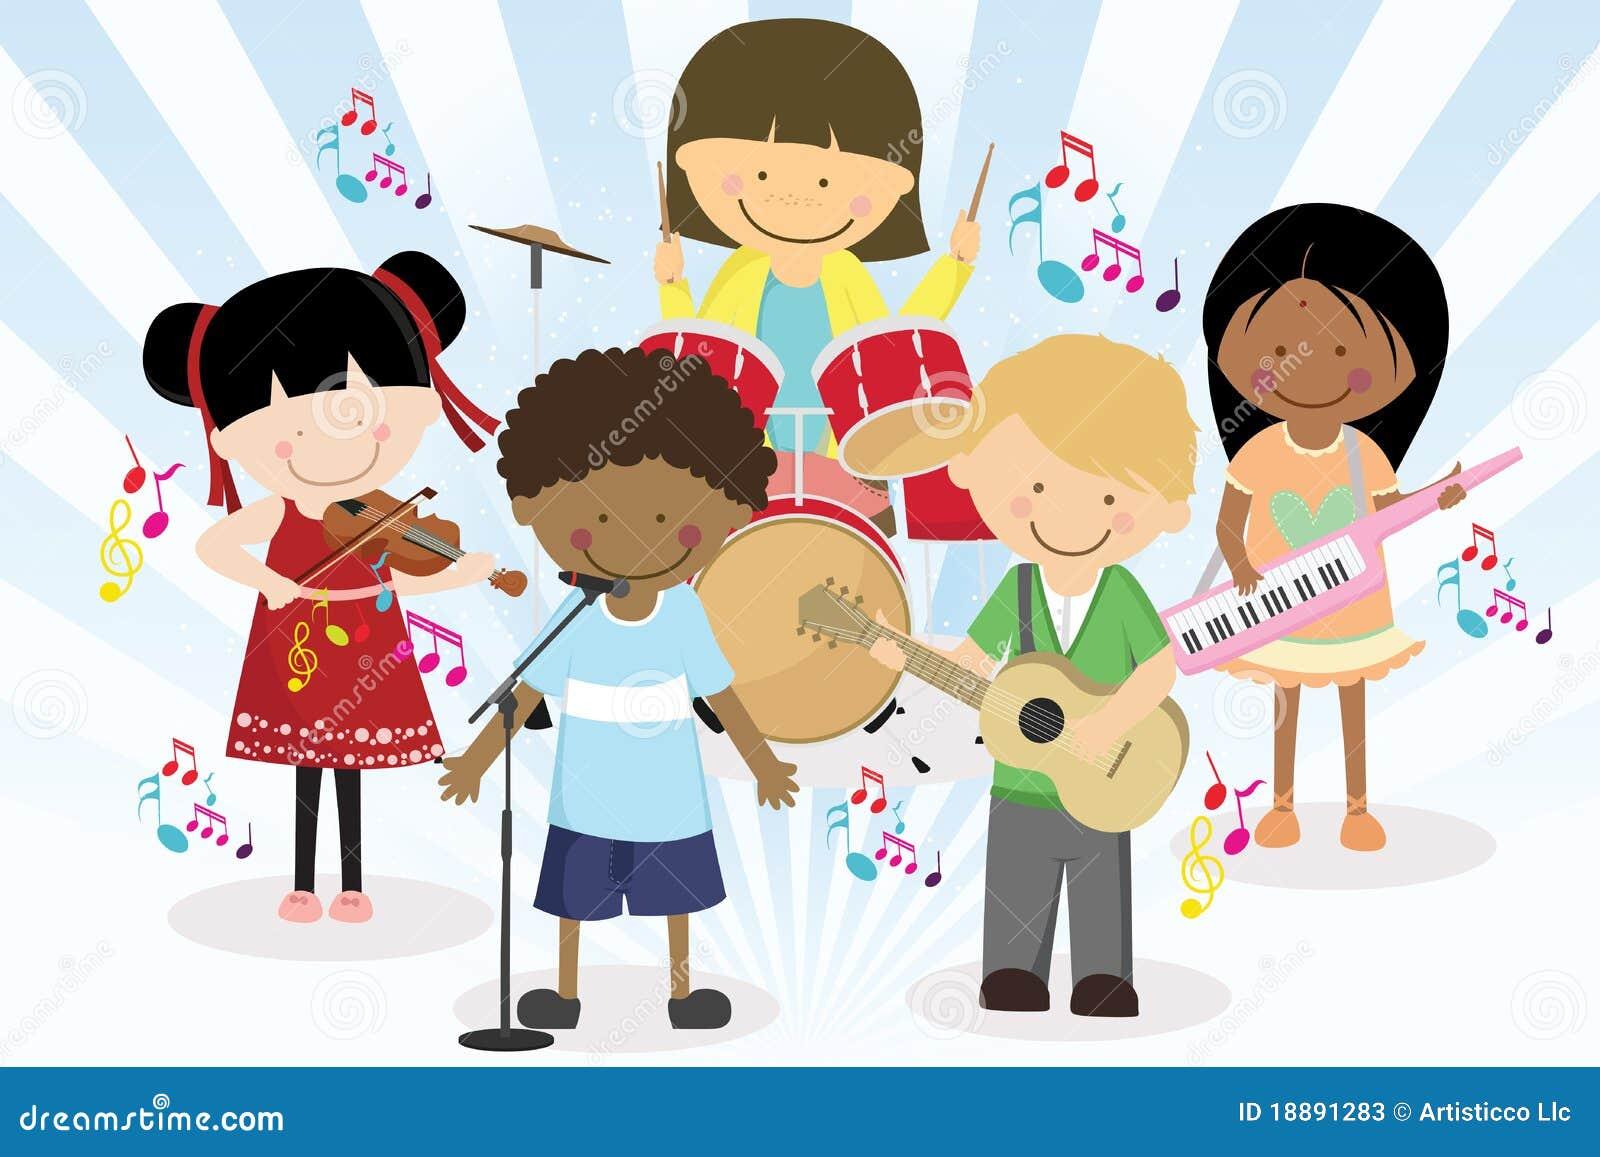 musica de little people: